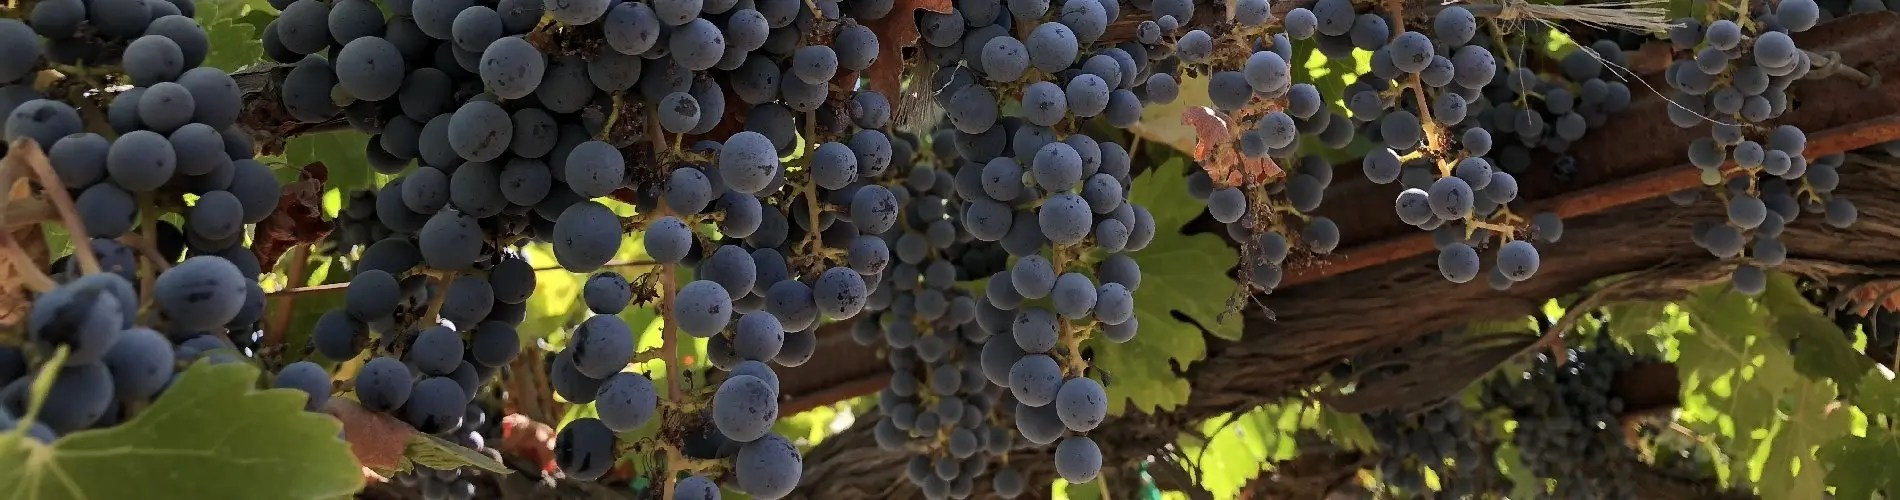 Cabernet Sauvignon vines and grapes